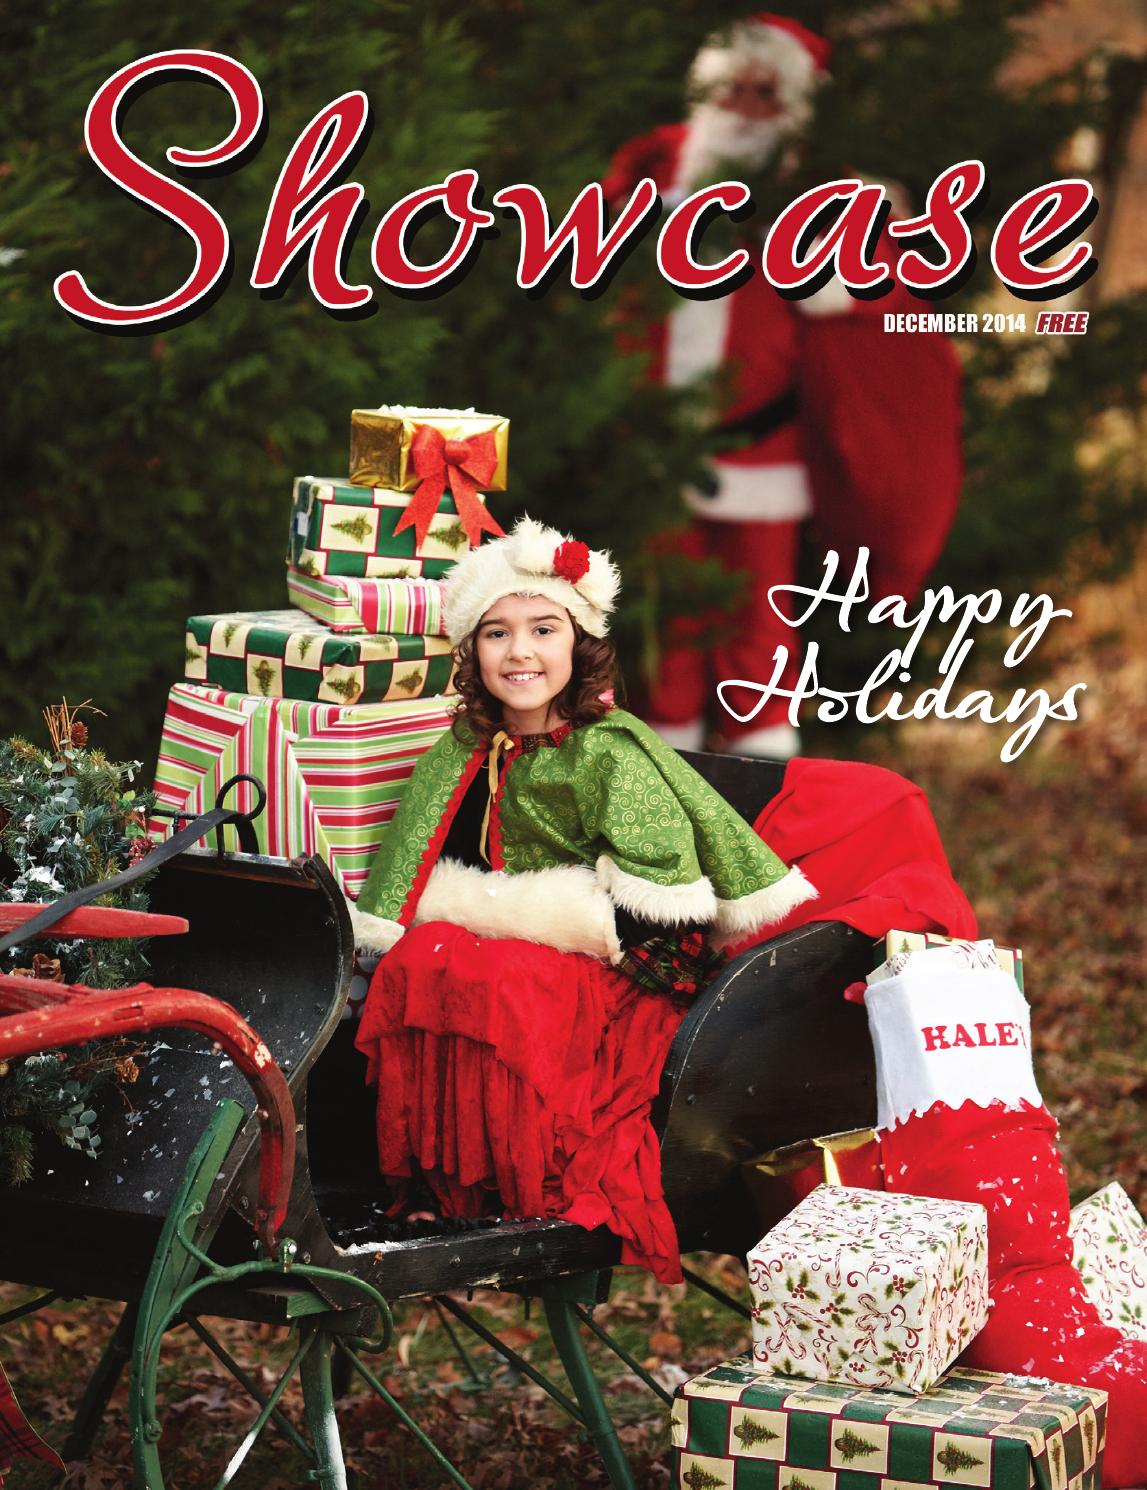 Showcase 1214 4web by Andrew Brooks Media Group - Issuu